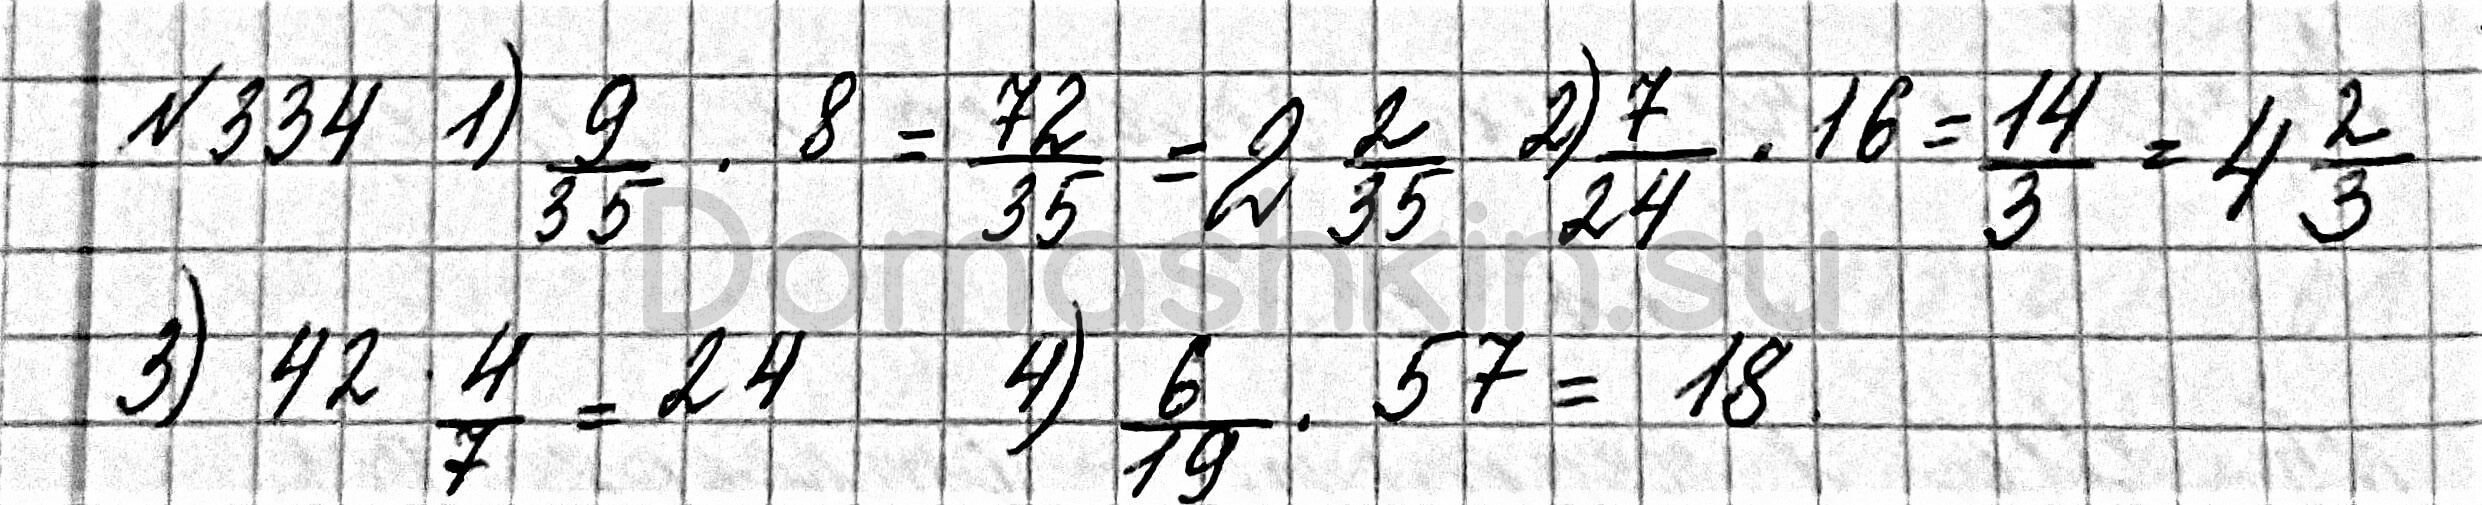 Математика 6 класс учебник Мерзляк номер 334 решение